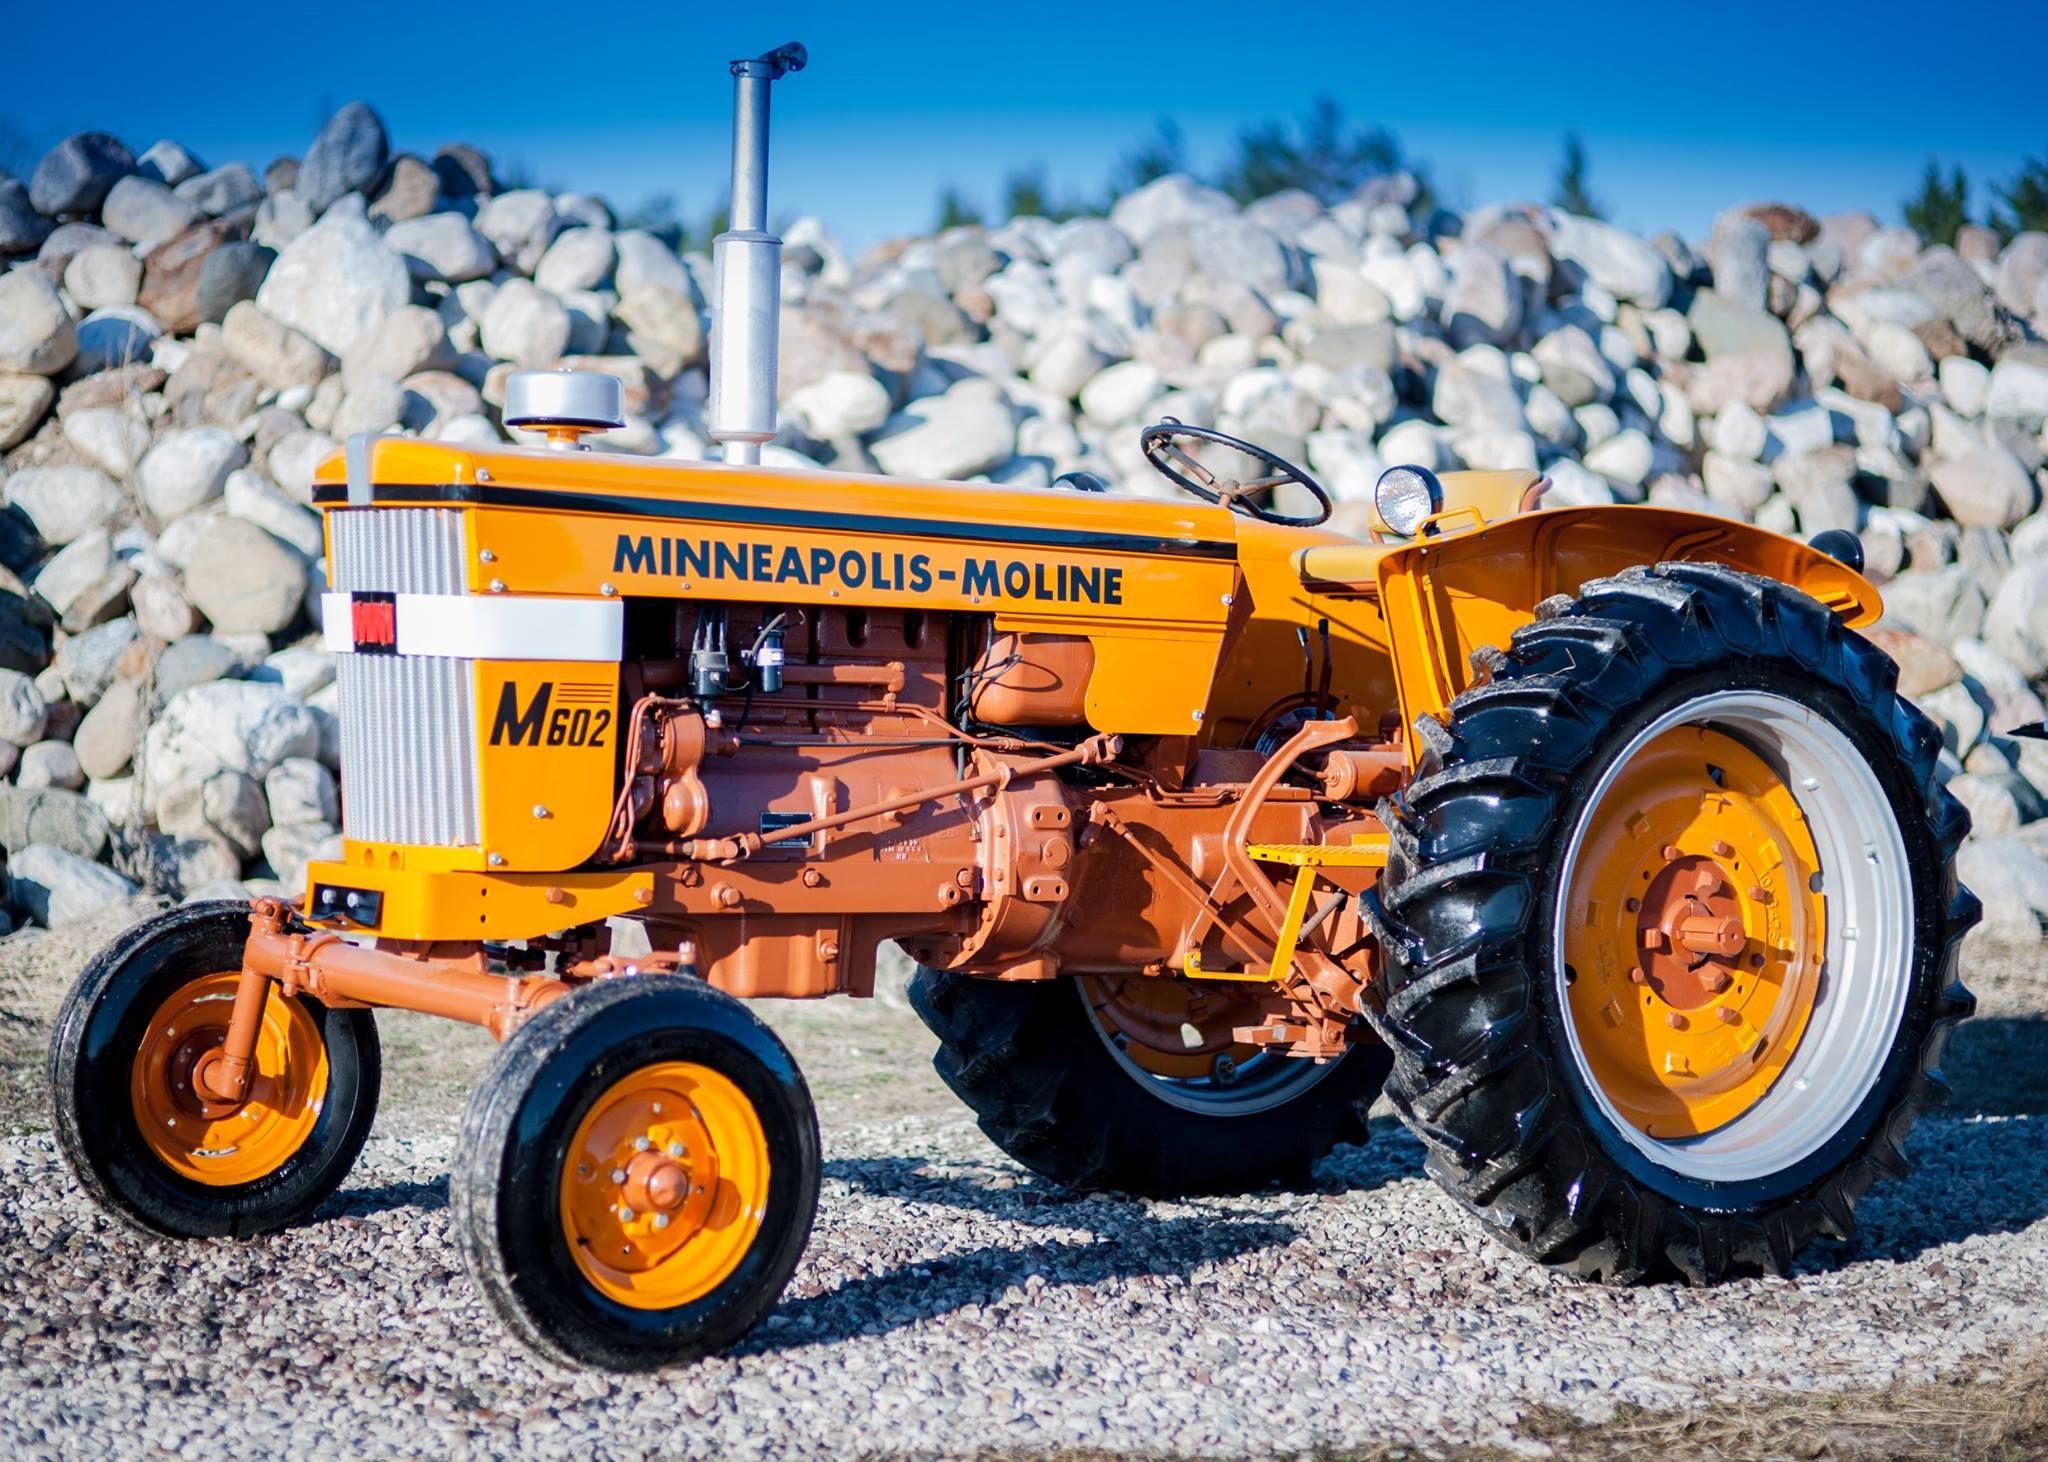 IT Shop Minneapolis Moline GVI Tractor Service Manual Agricultural &  Construction Machinery TractorsLachshaus-Riga